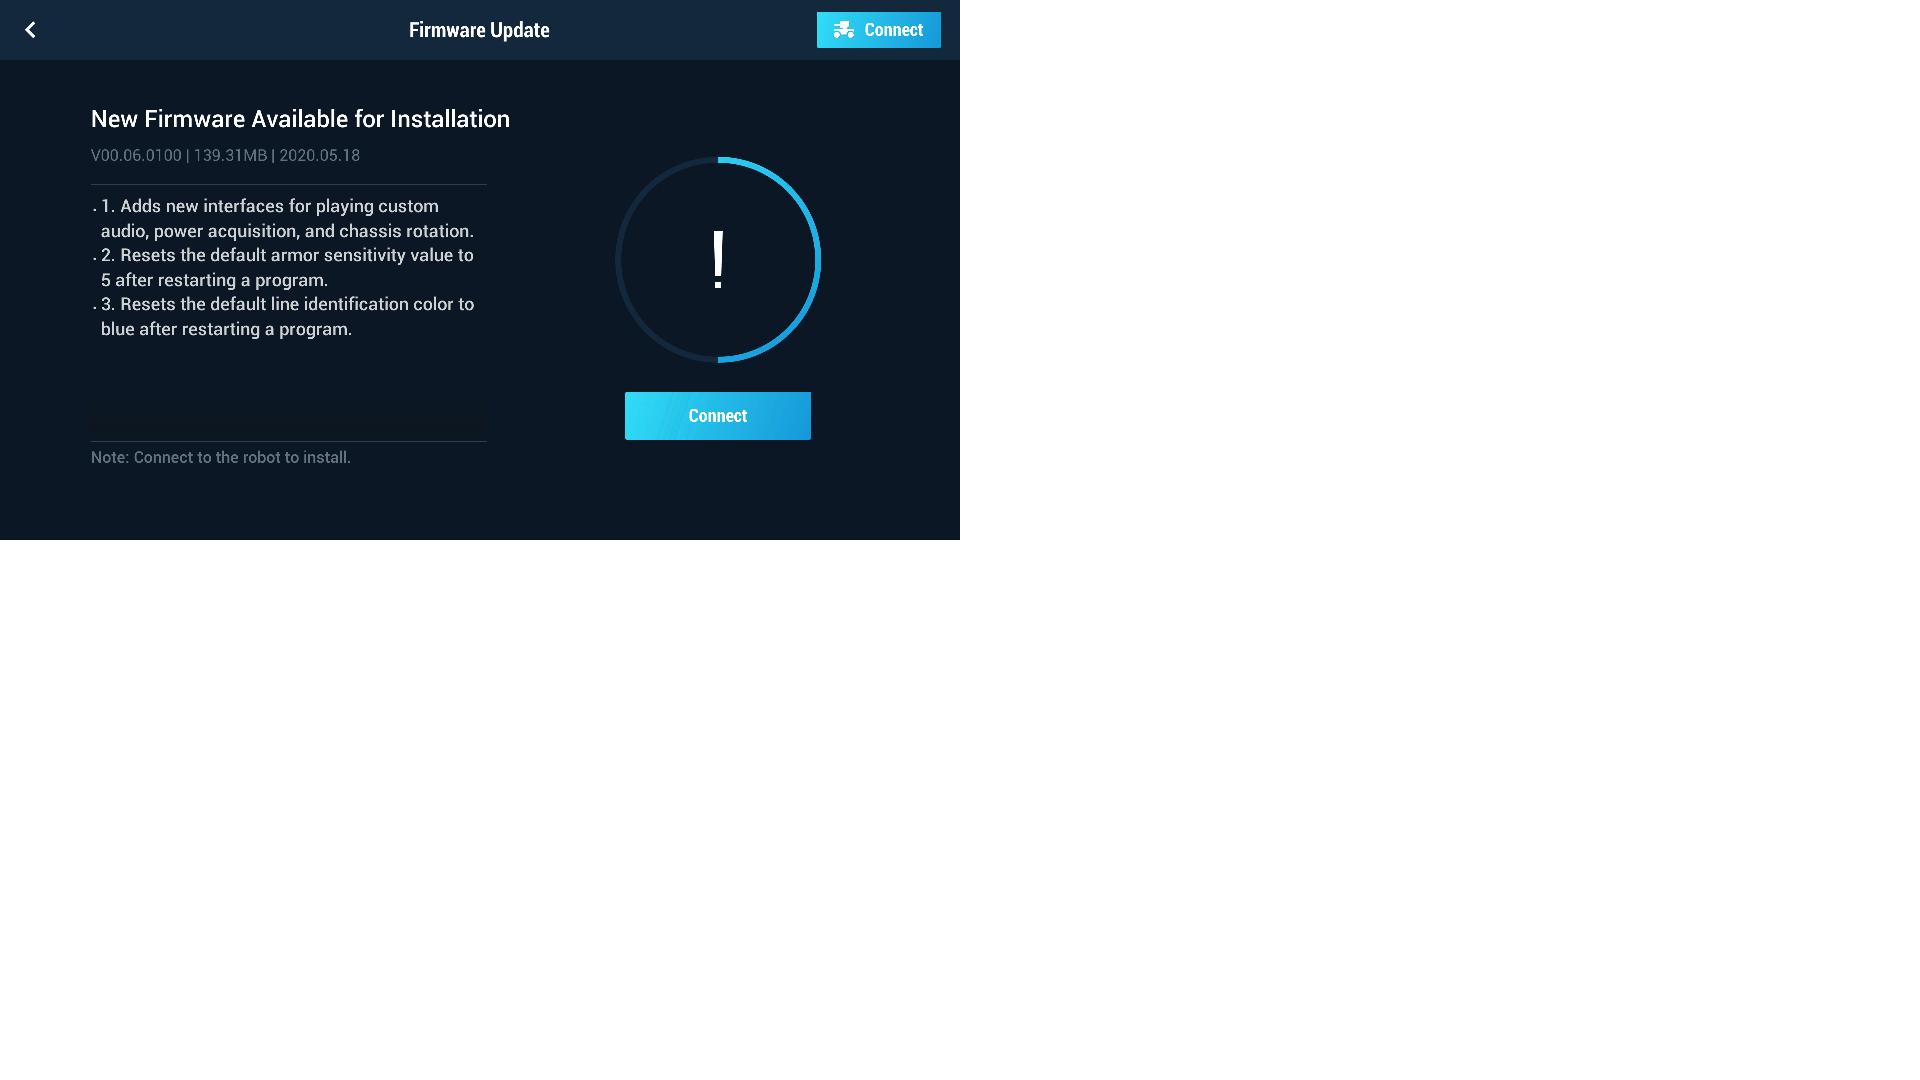 My windows firmware screen tonight